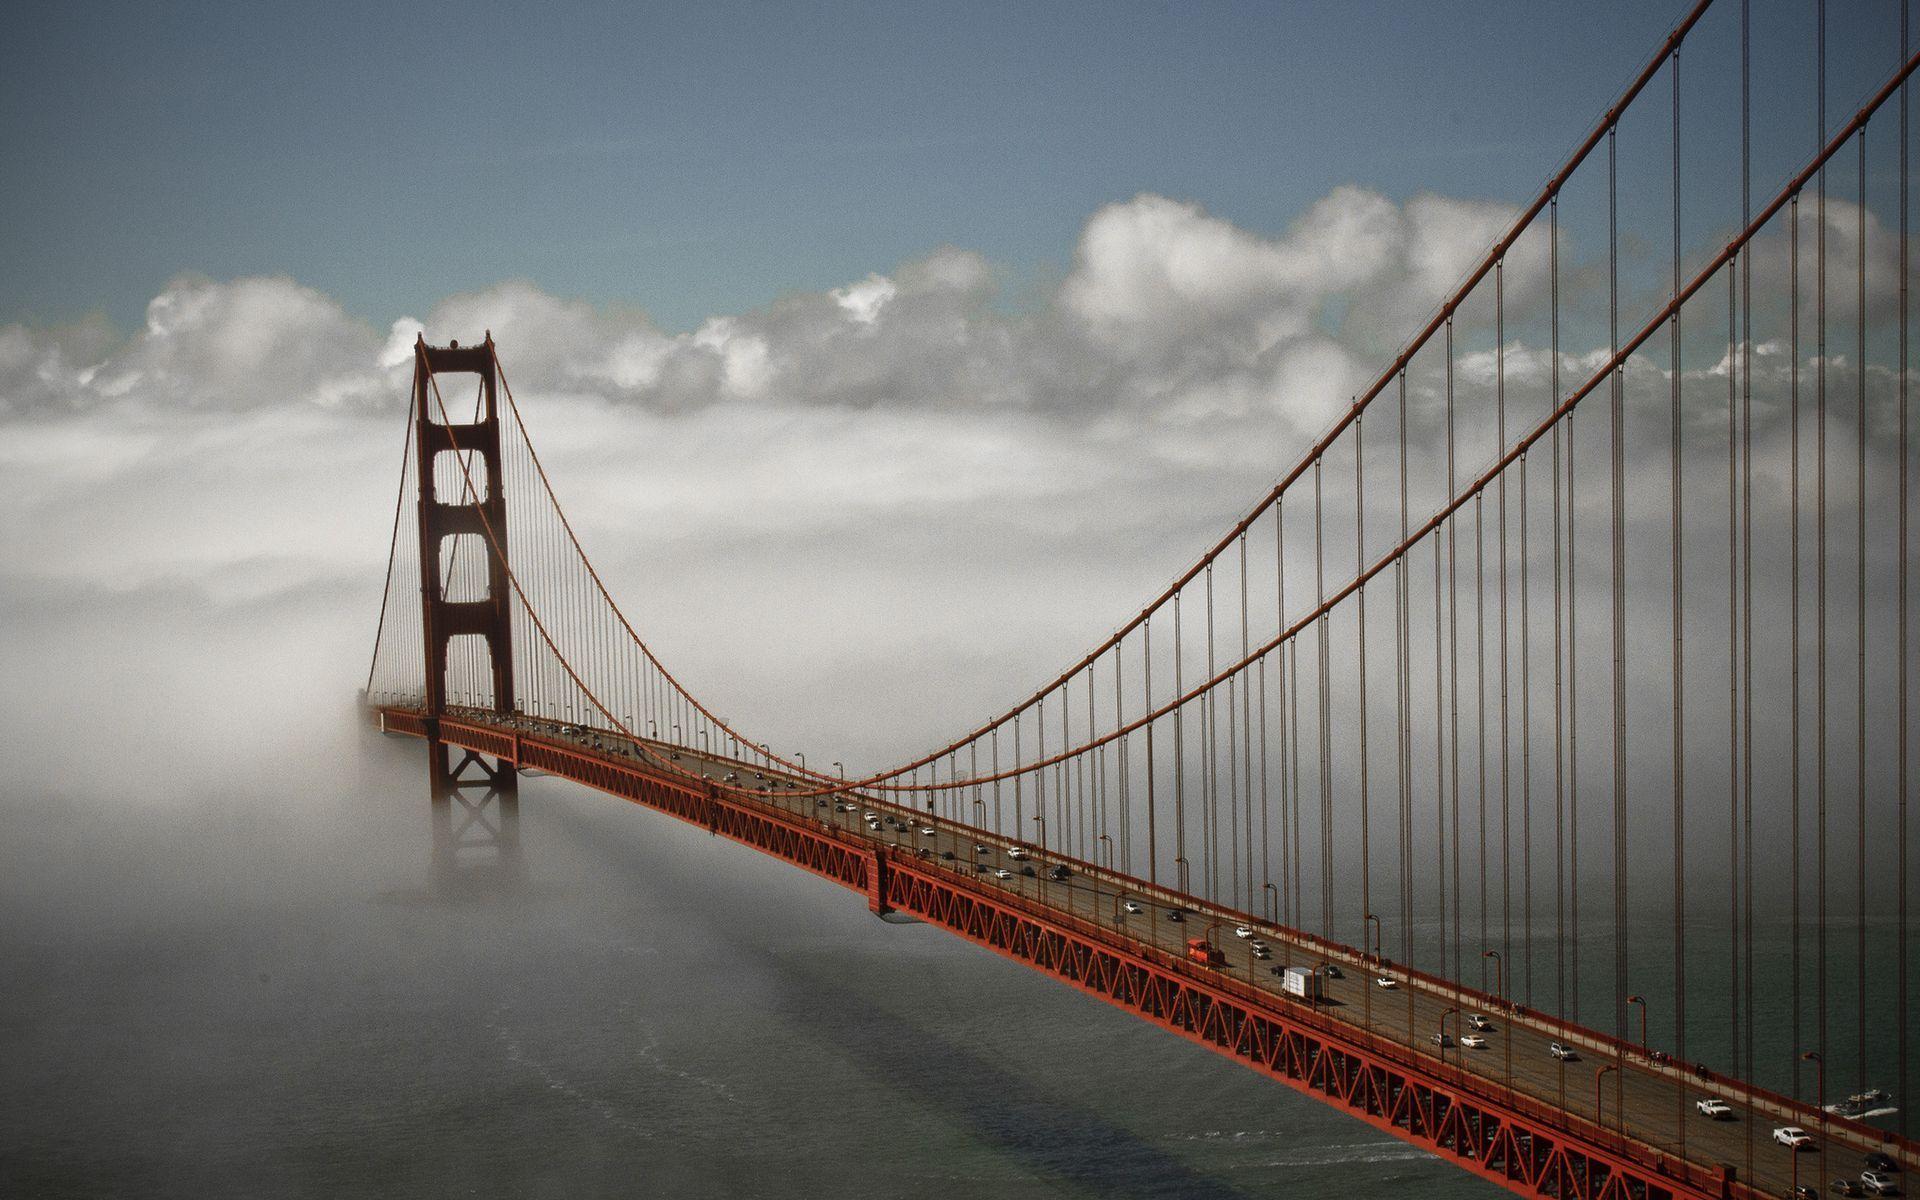 Bridge online gratuito